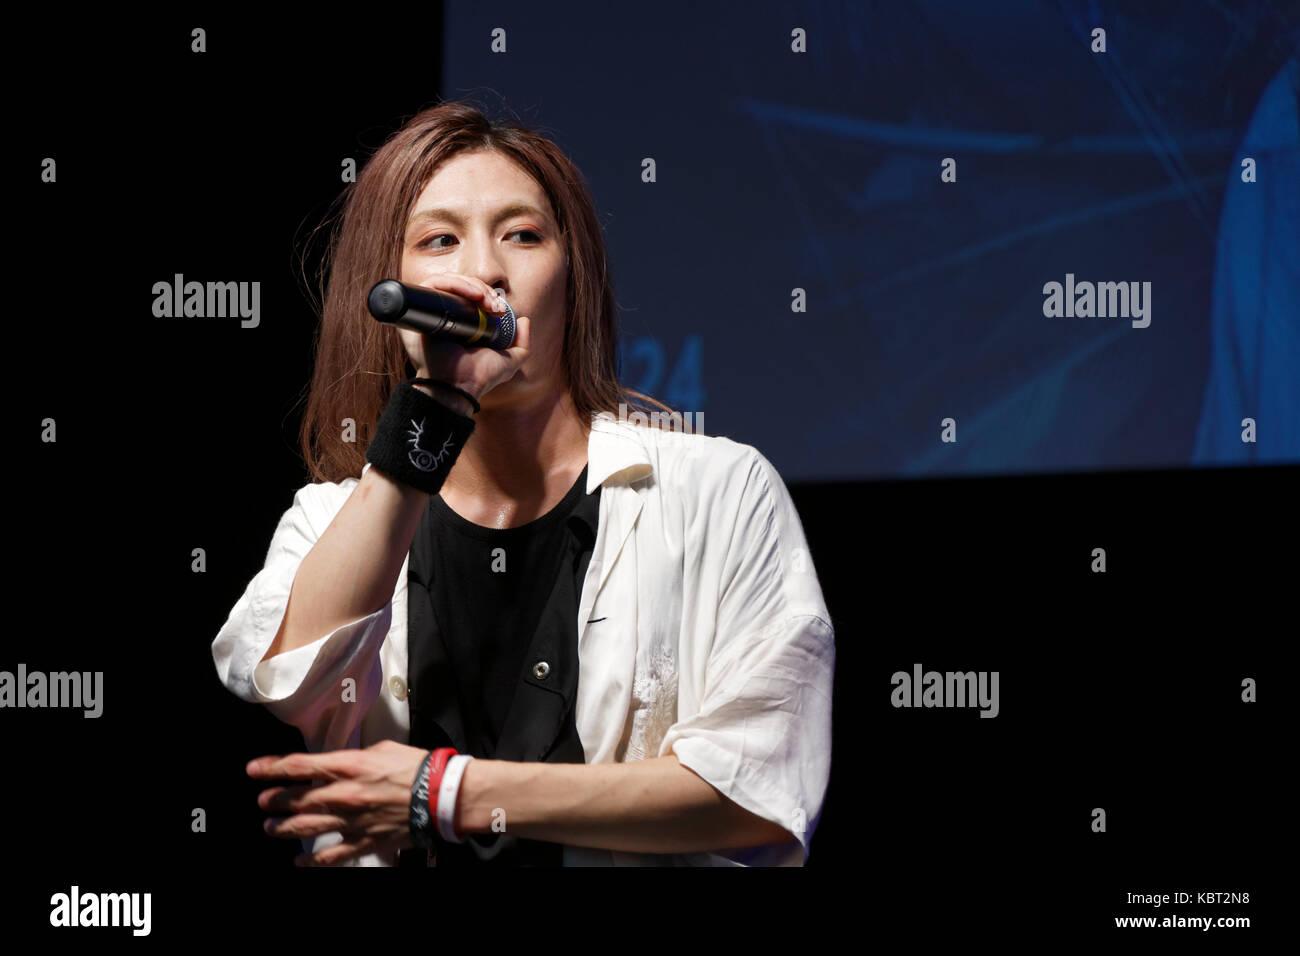 Paris, France, 30th Sep 2017. Singer S!N attends the 24th édition Paris Manga Sci-Fi Show. Credit: Bernard - Stock Image